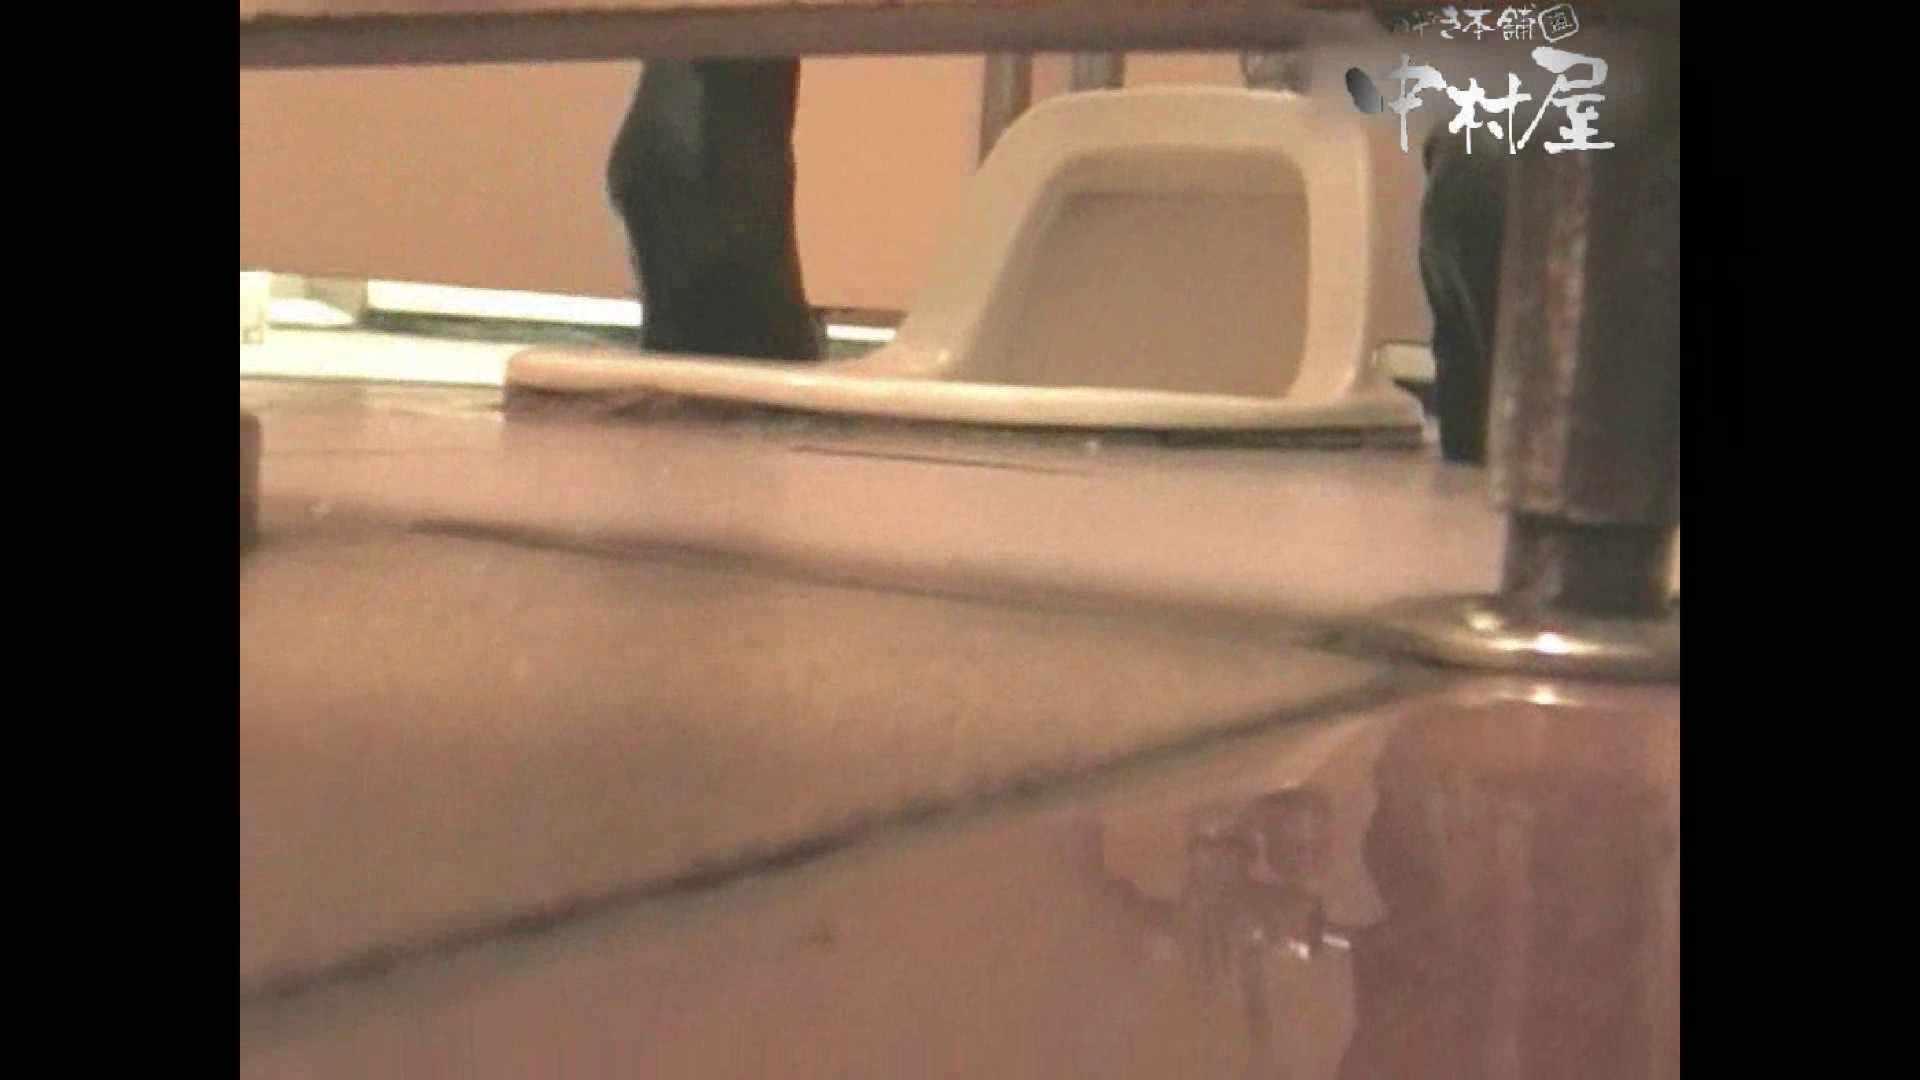 岩手県在住盗撮師盗撮記録vol.03 マンコ無修正 盗撮セックス無修正動画無料 99画像 60